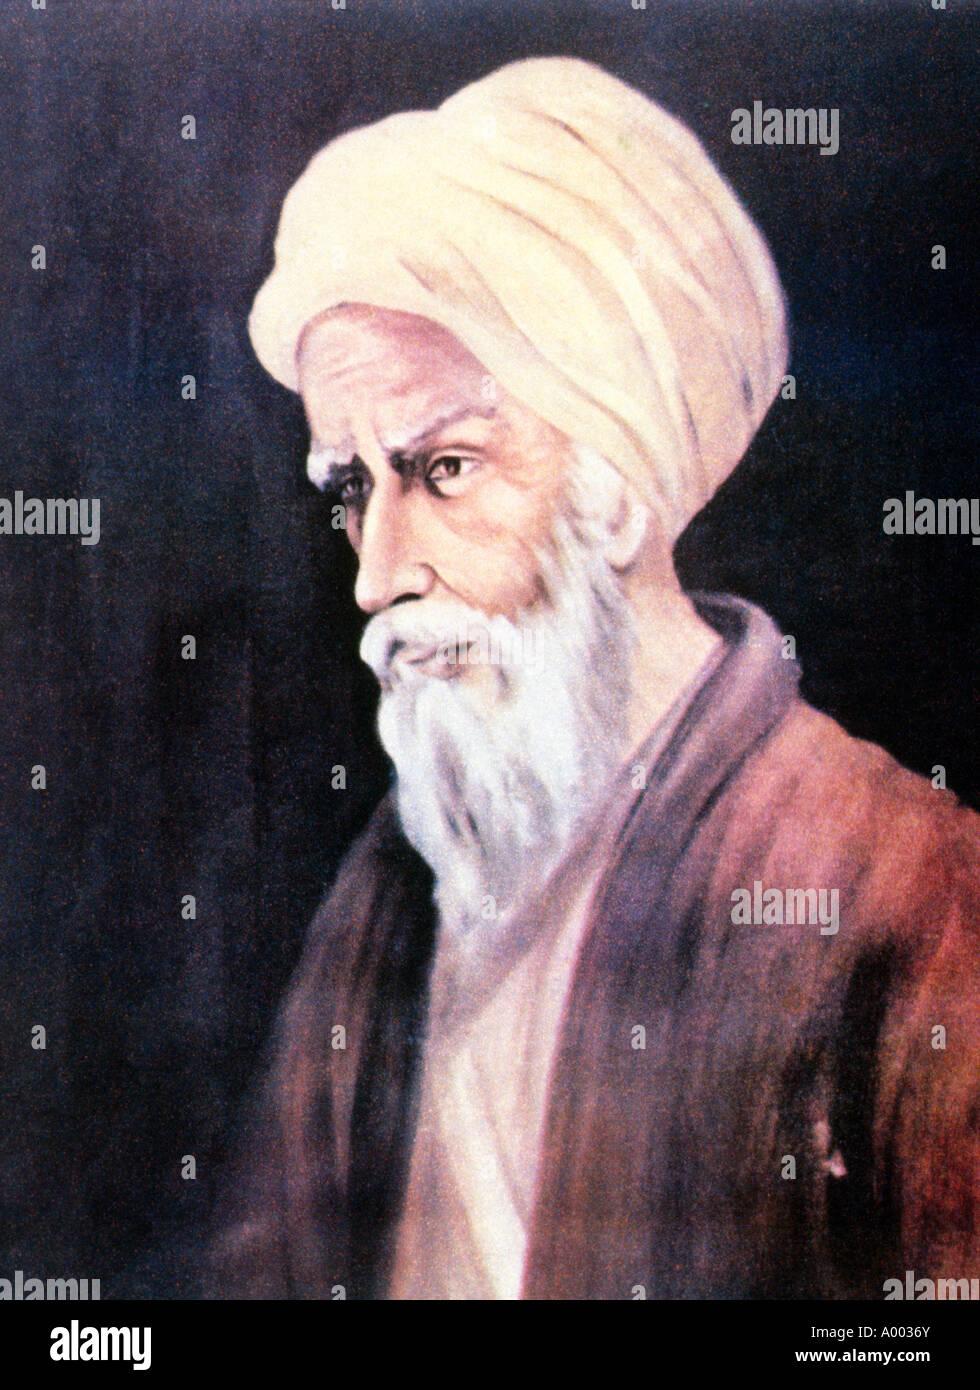 Abu Ali Hassan Ibn Al-haitham 965 -1040 Ad Physicist Optics Mathematics Physics Discovered Laws Of Refraction - Stock Image